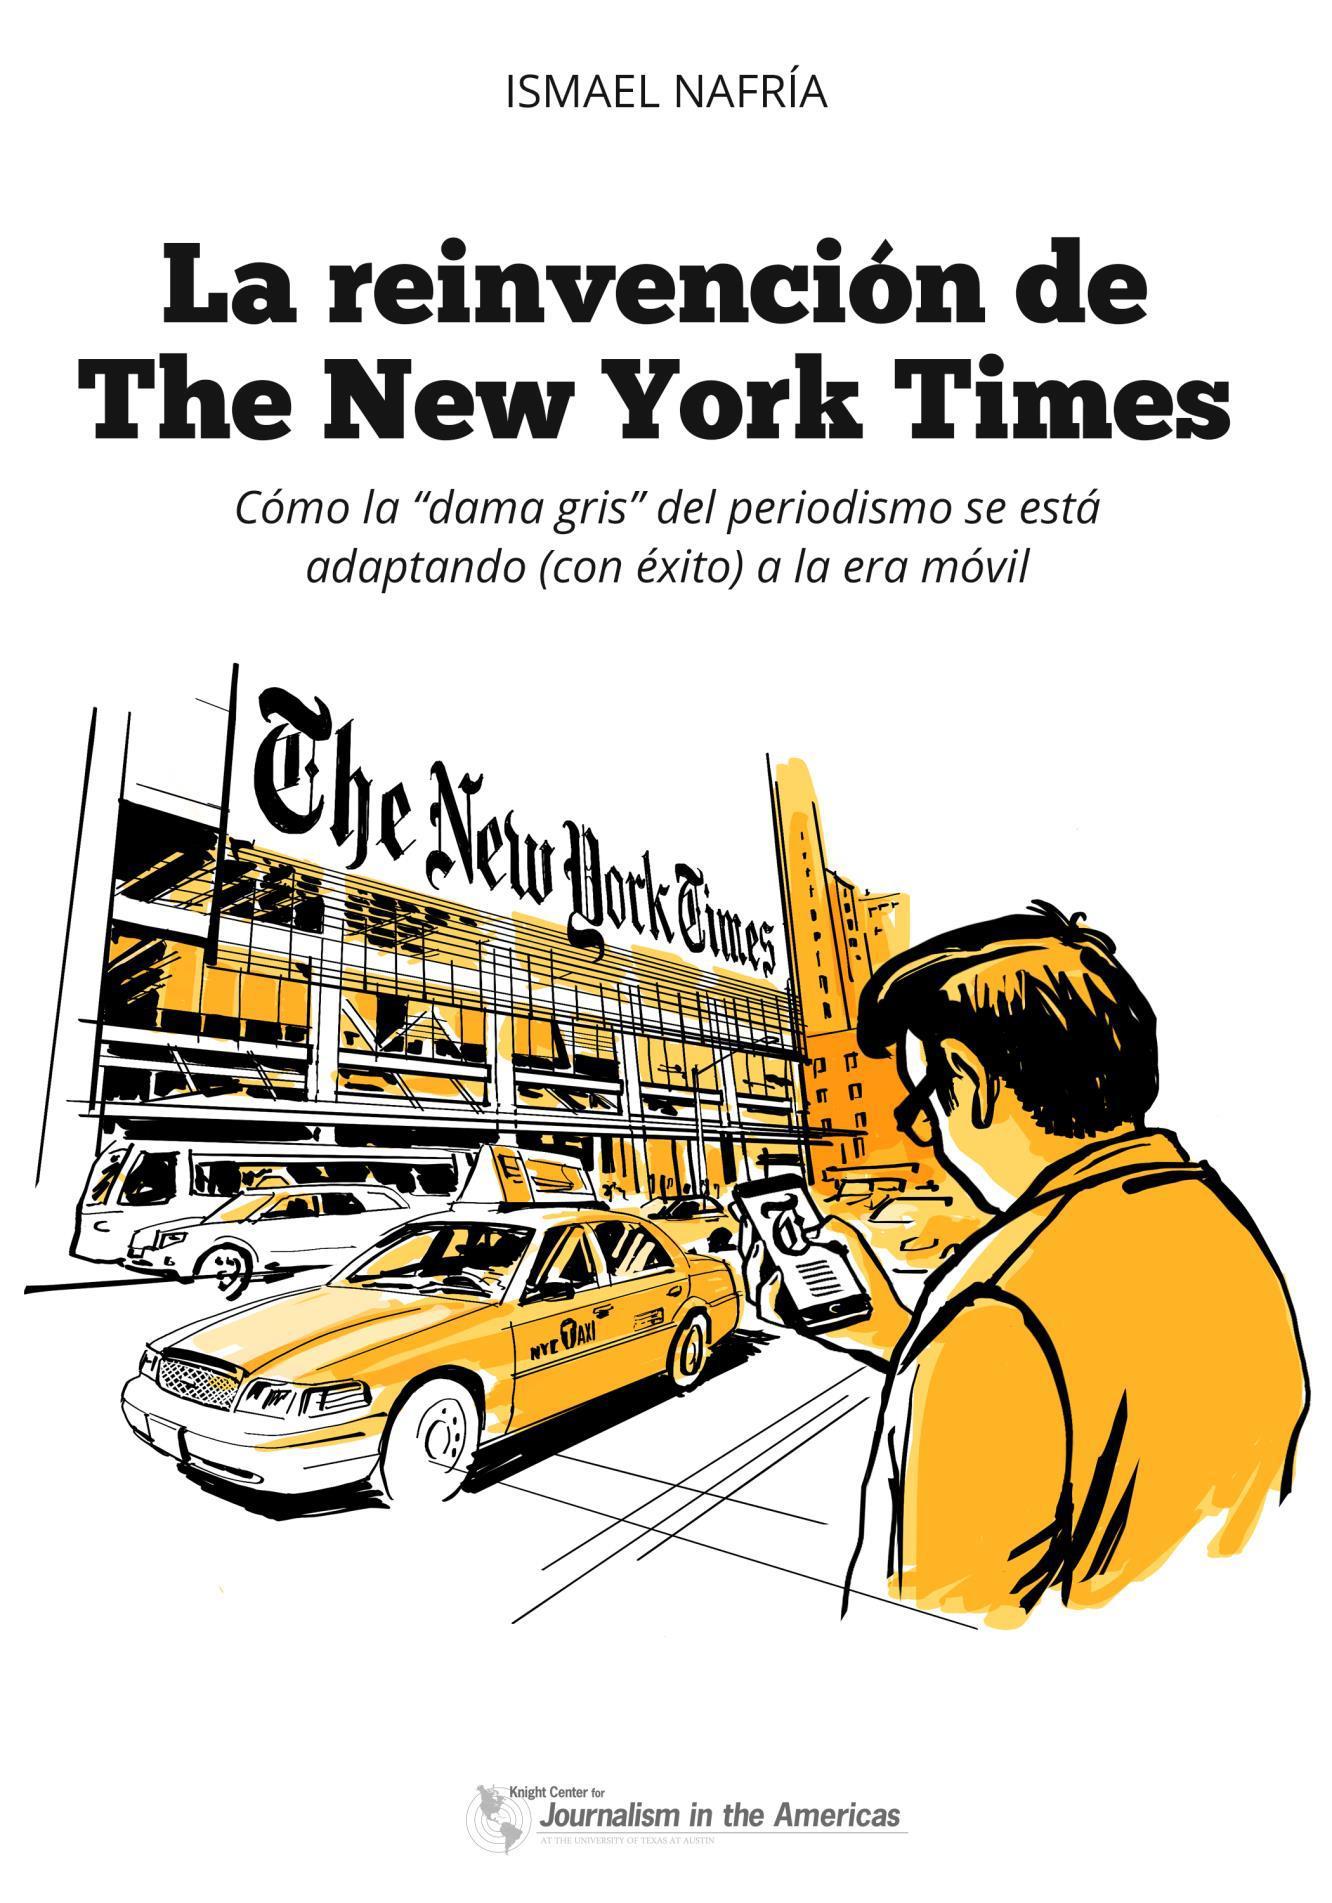 Cómo se está reinventando The New York Times